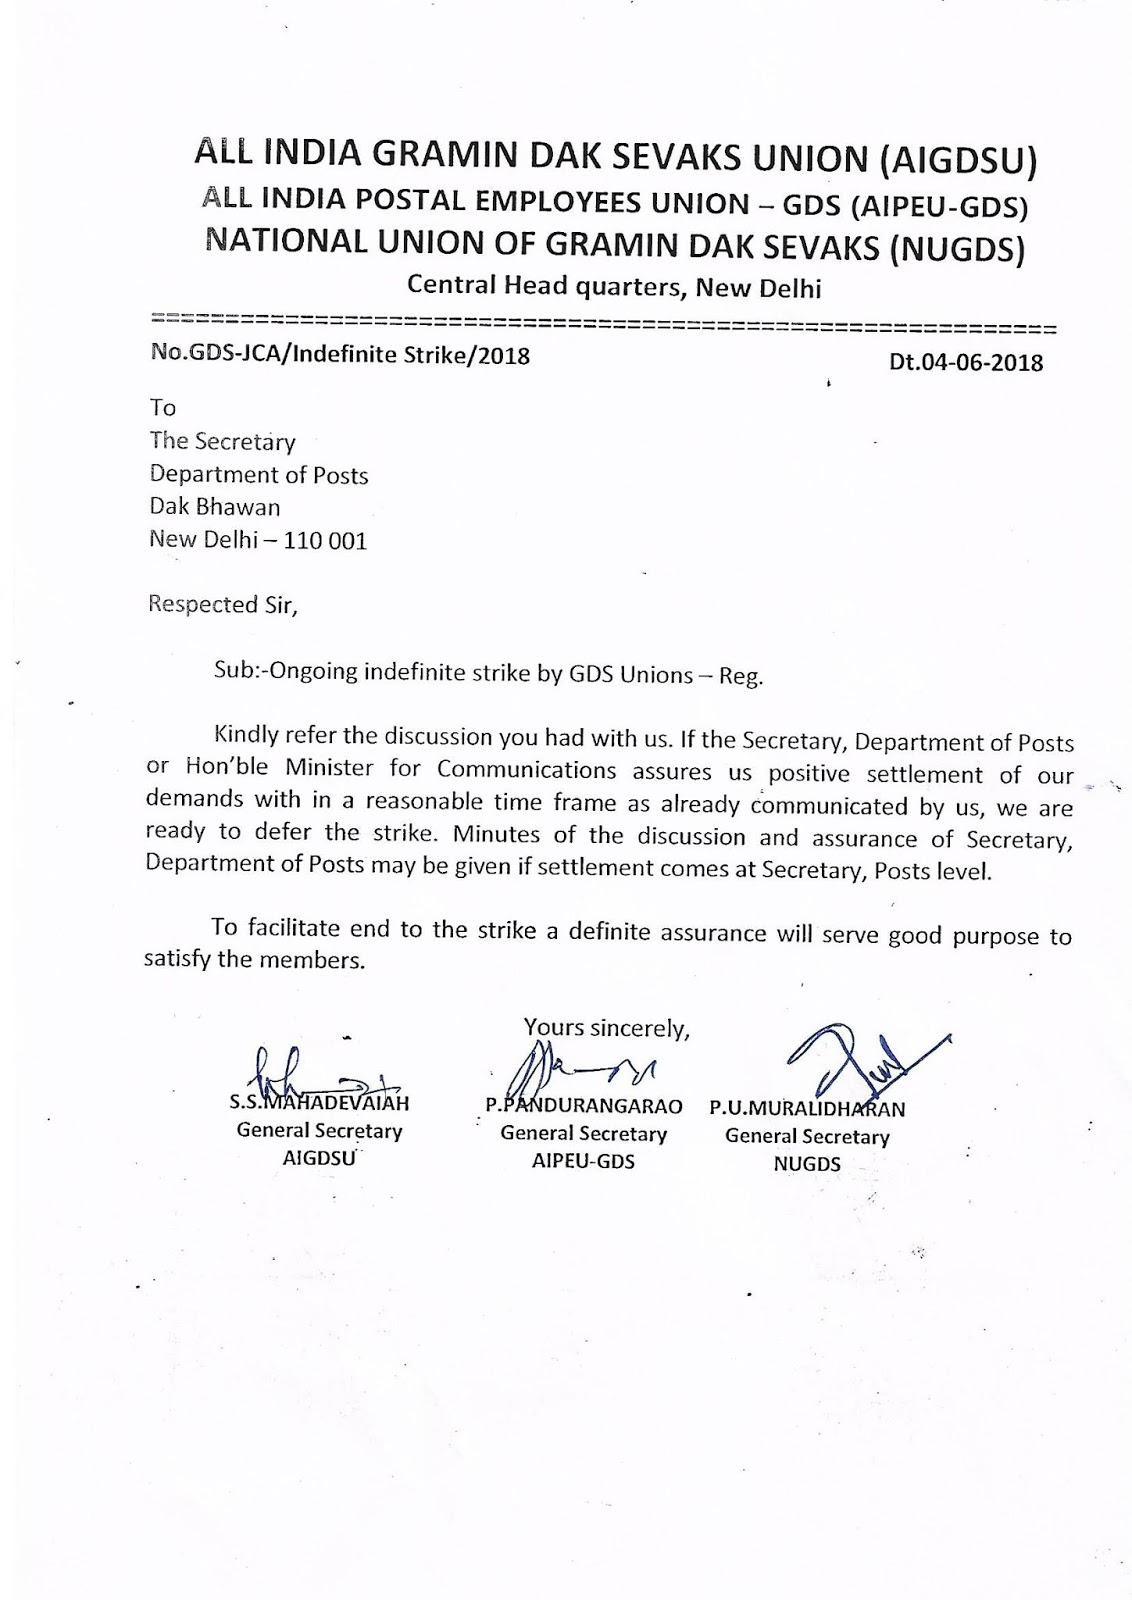 GDS JCA Letter to Secretary Posts